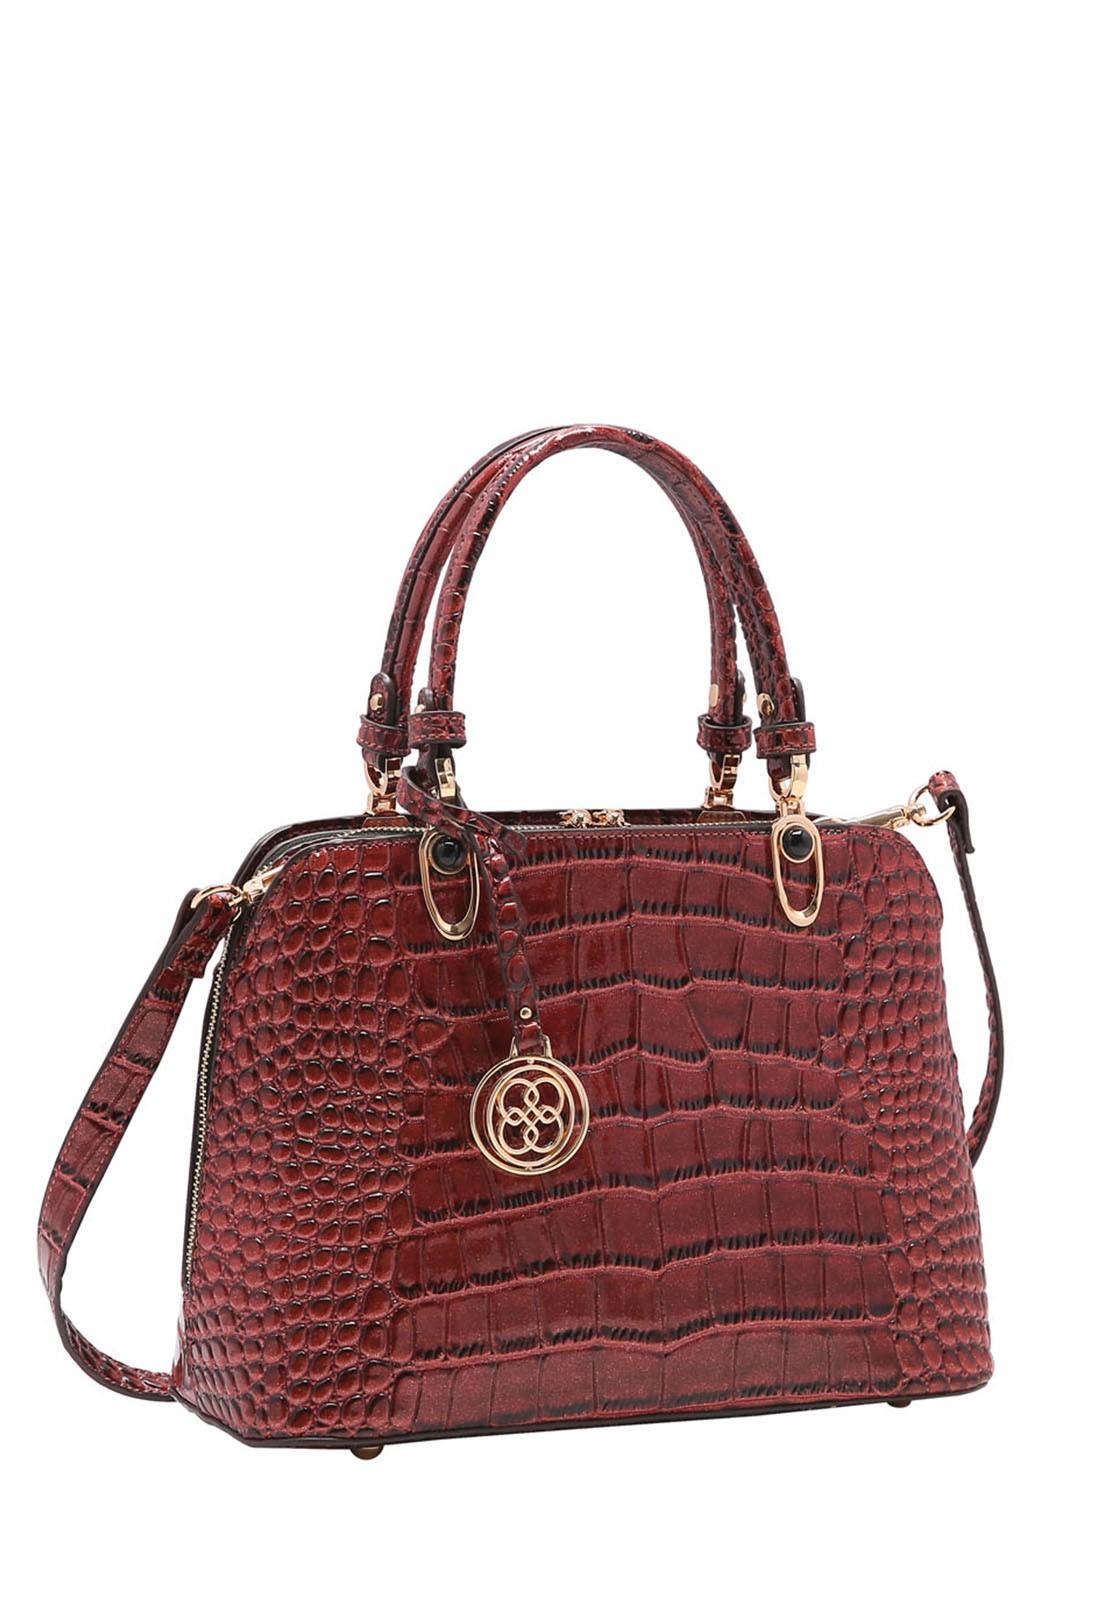 Bolsa Feminina Chenson Croco Gliter de Mão 3483196